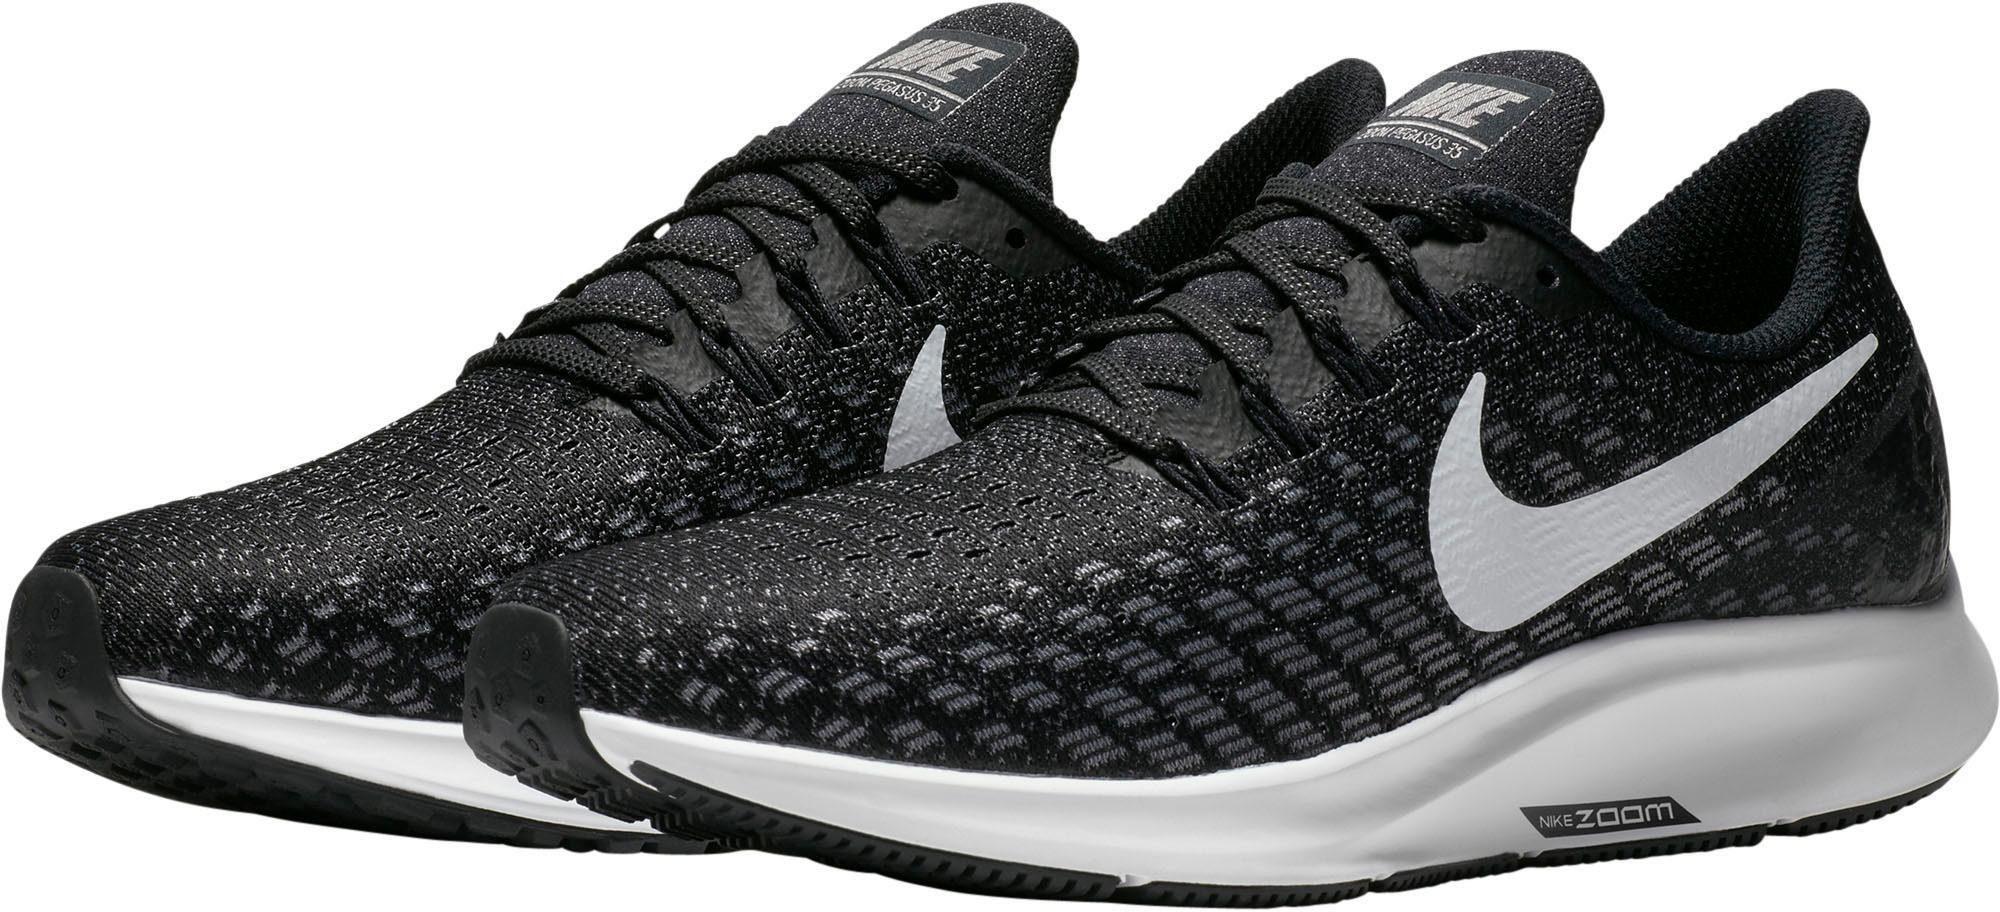 Nike »Wmns Air Zoom Pegasus 35« Laufschuh kaufen | OTTO